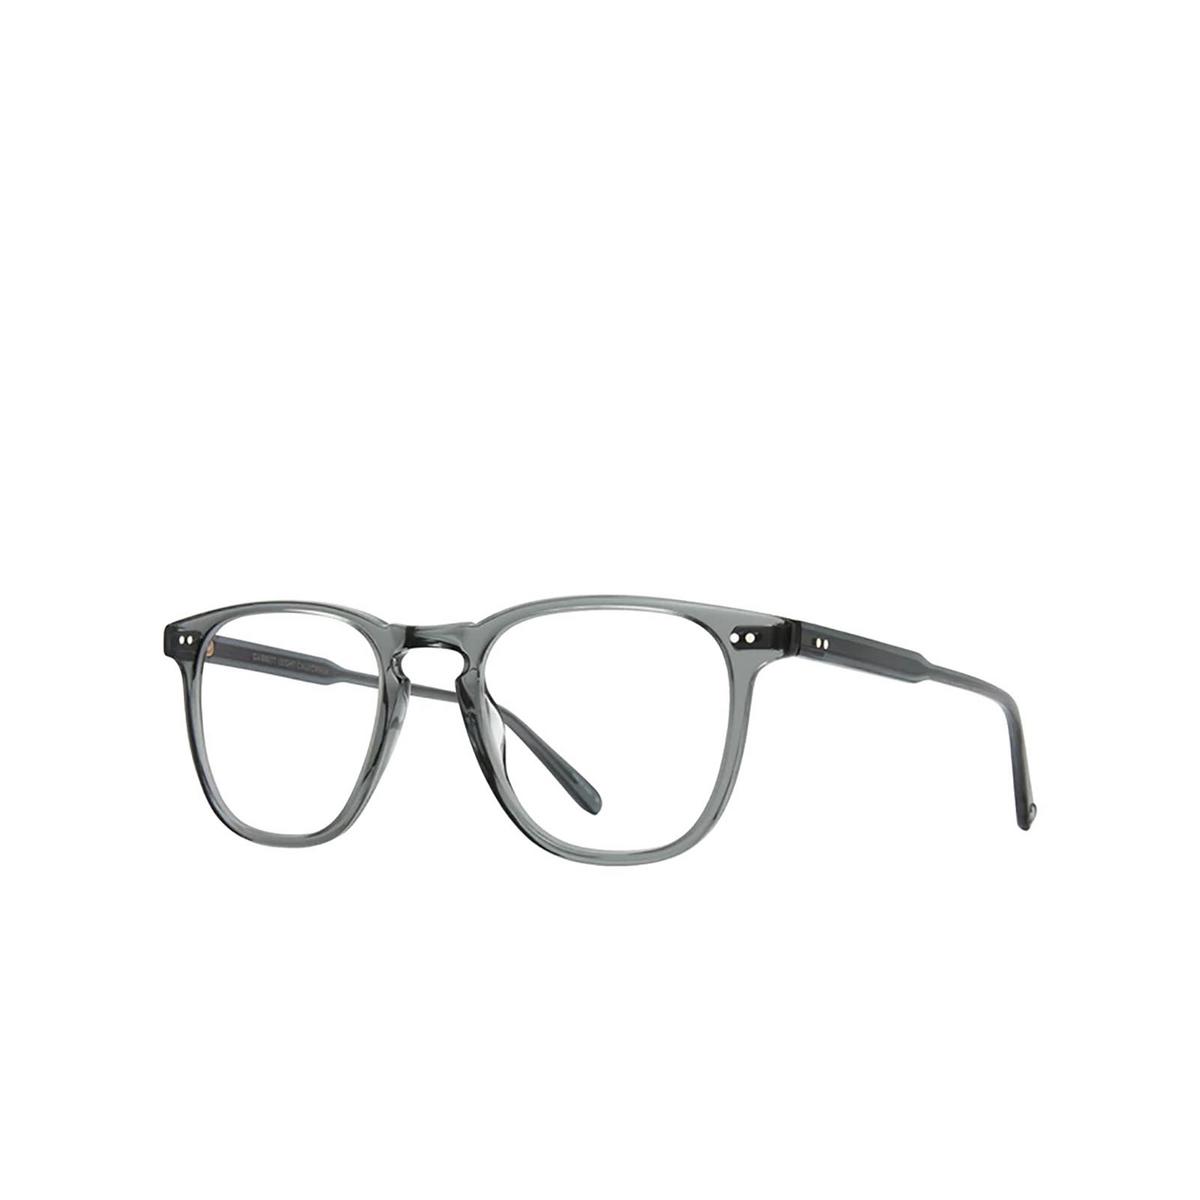 Garrett Leight® Square Eyeglasses: Brooks color Sea Grey Sgy - three-quarters view.